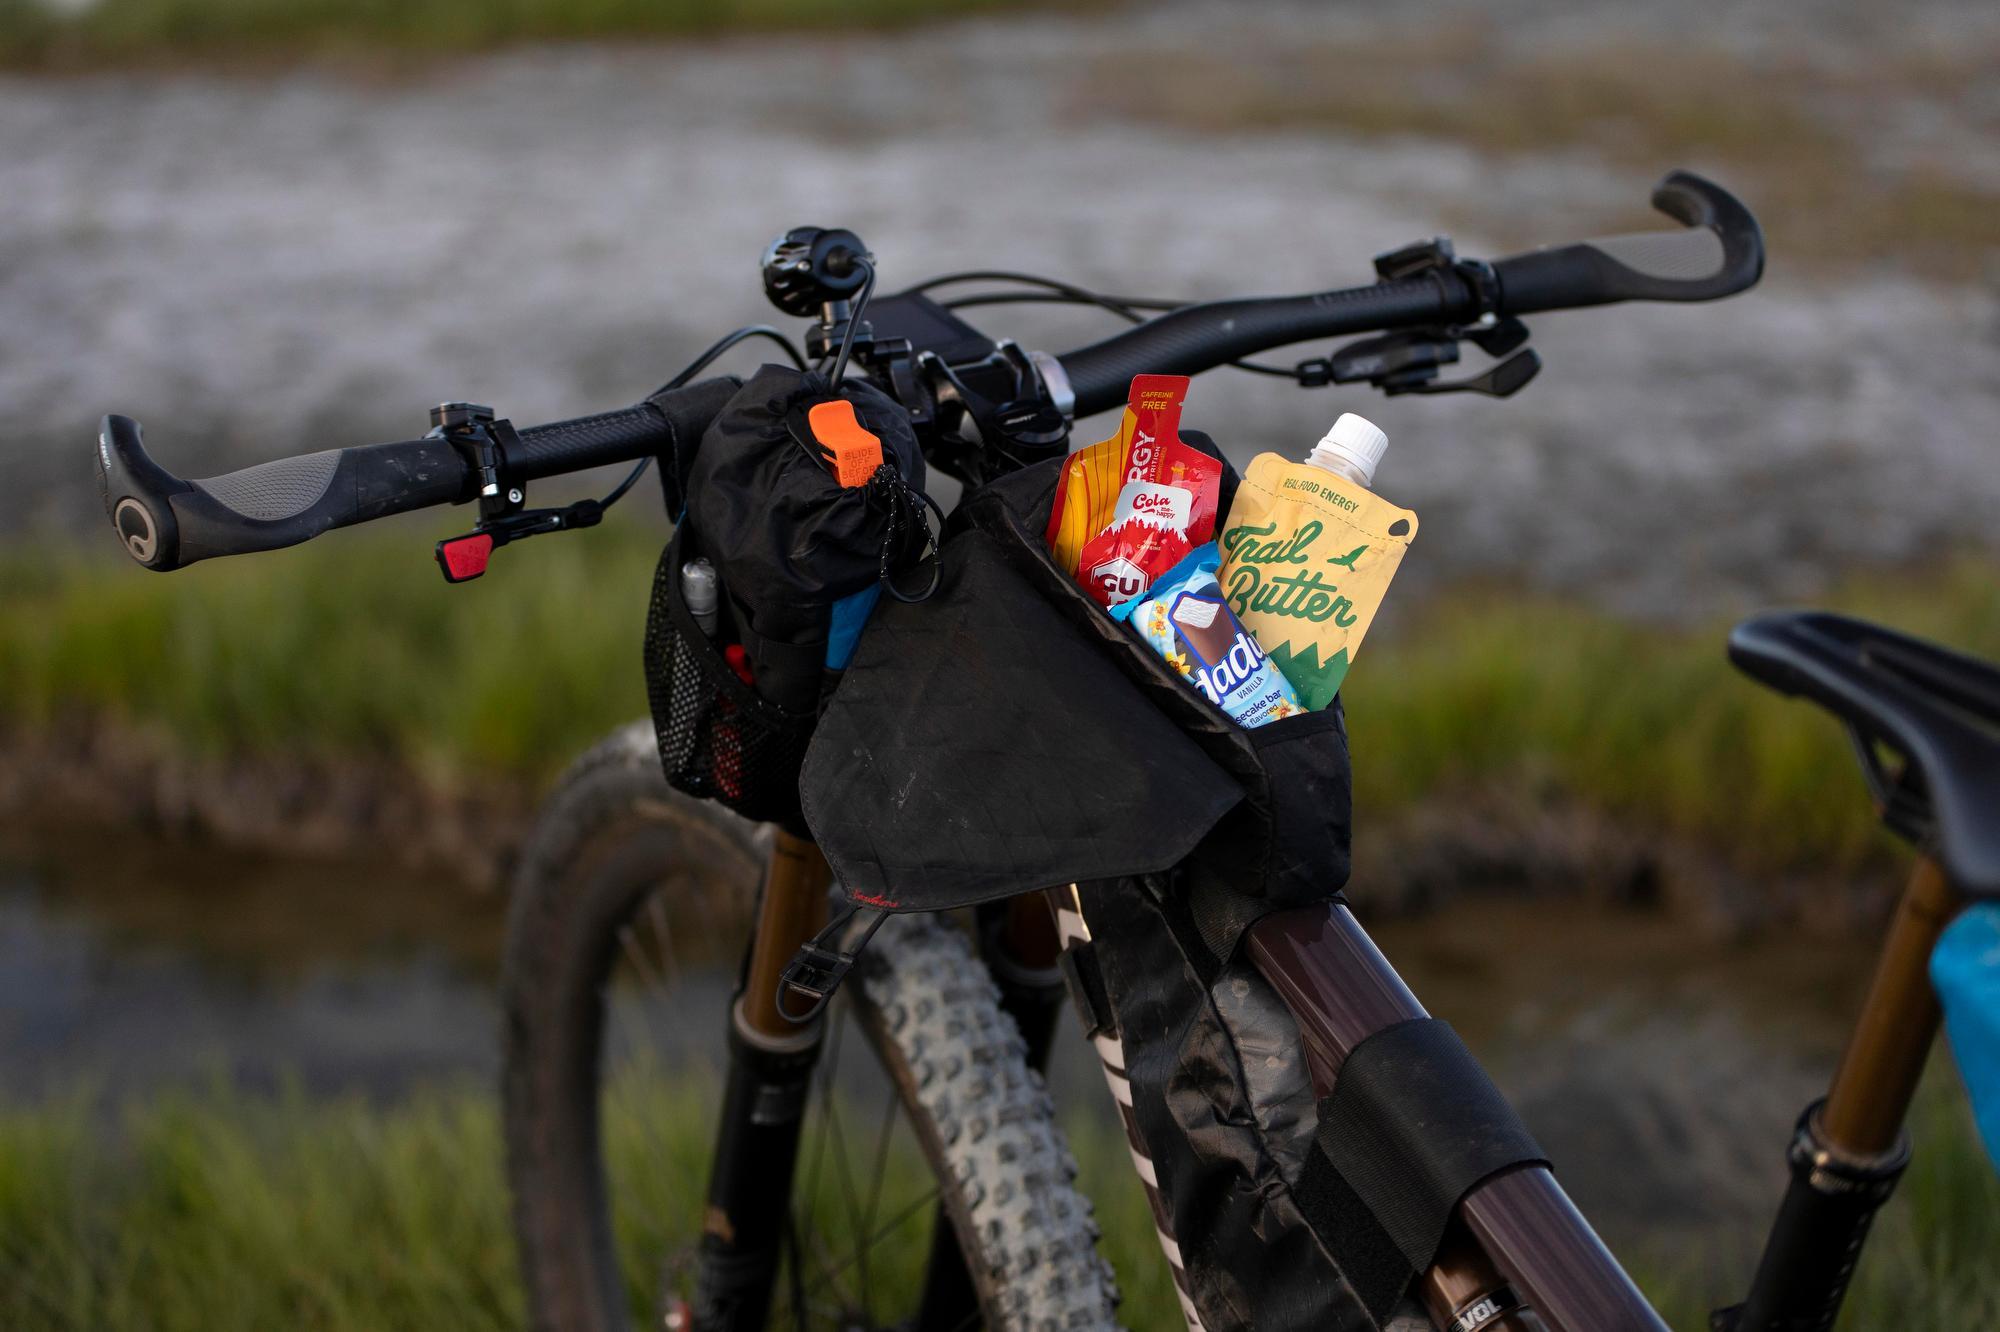 Lael Wilcox Kenai 250 Bike & Gear 020